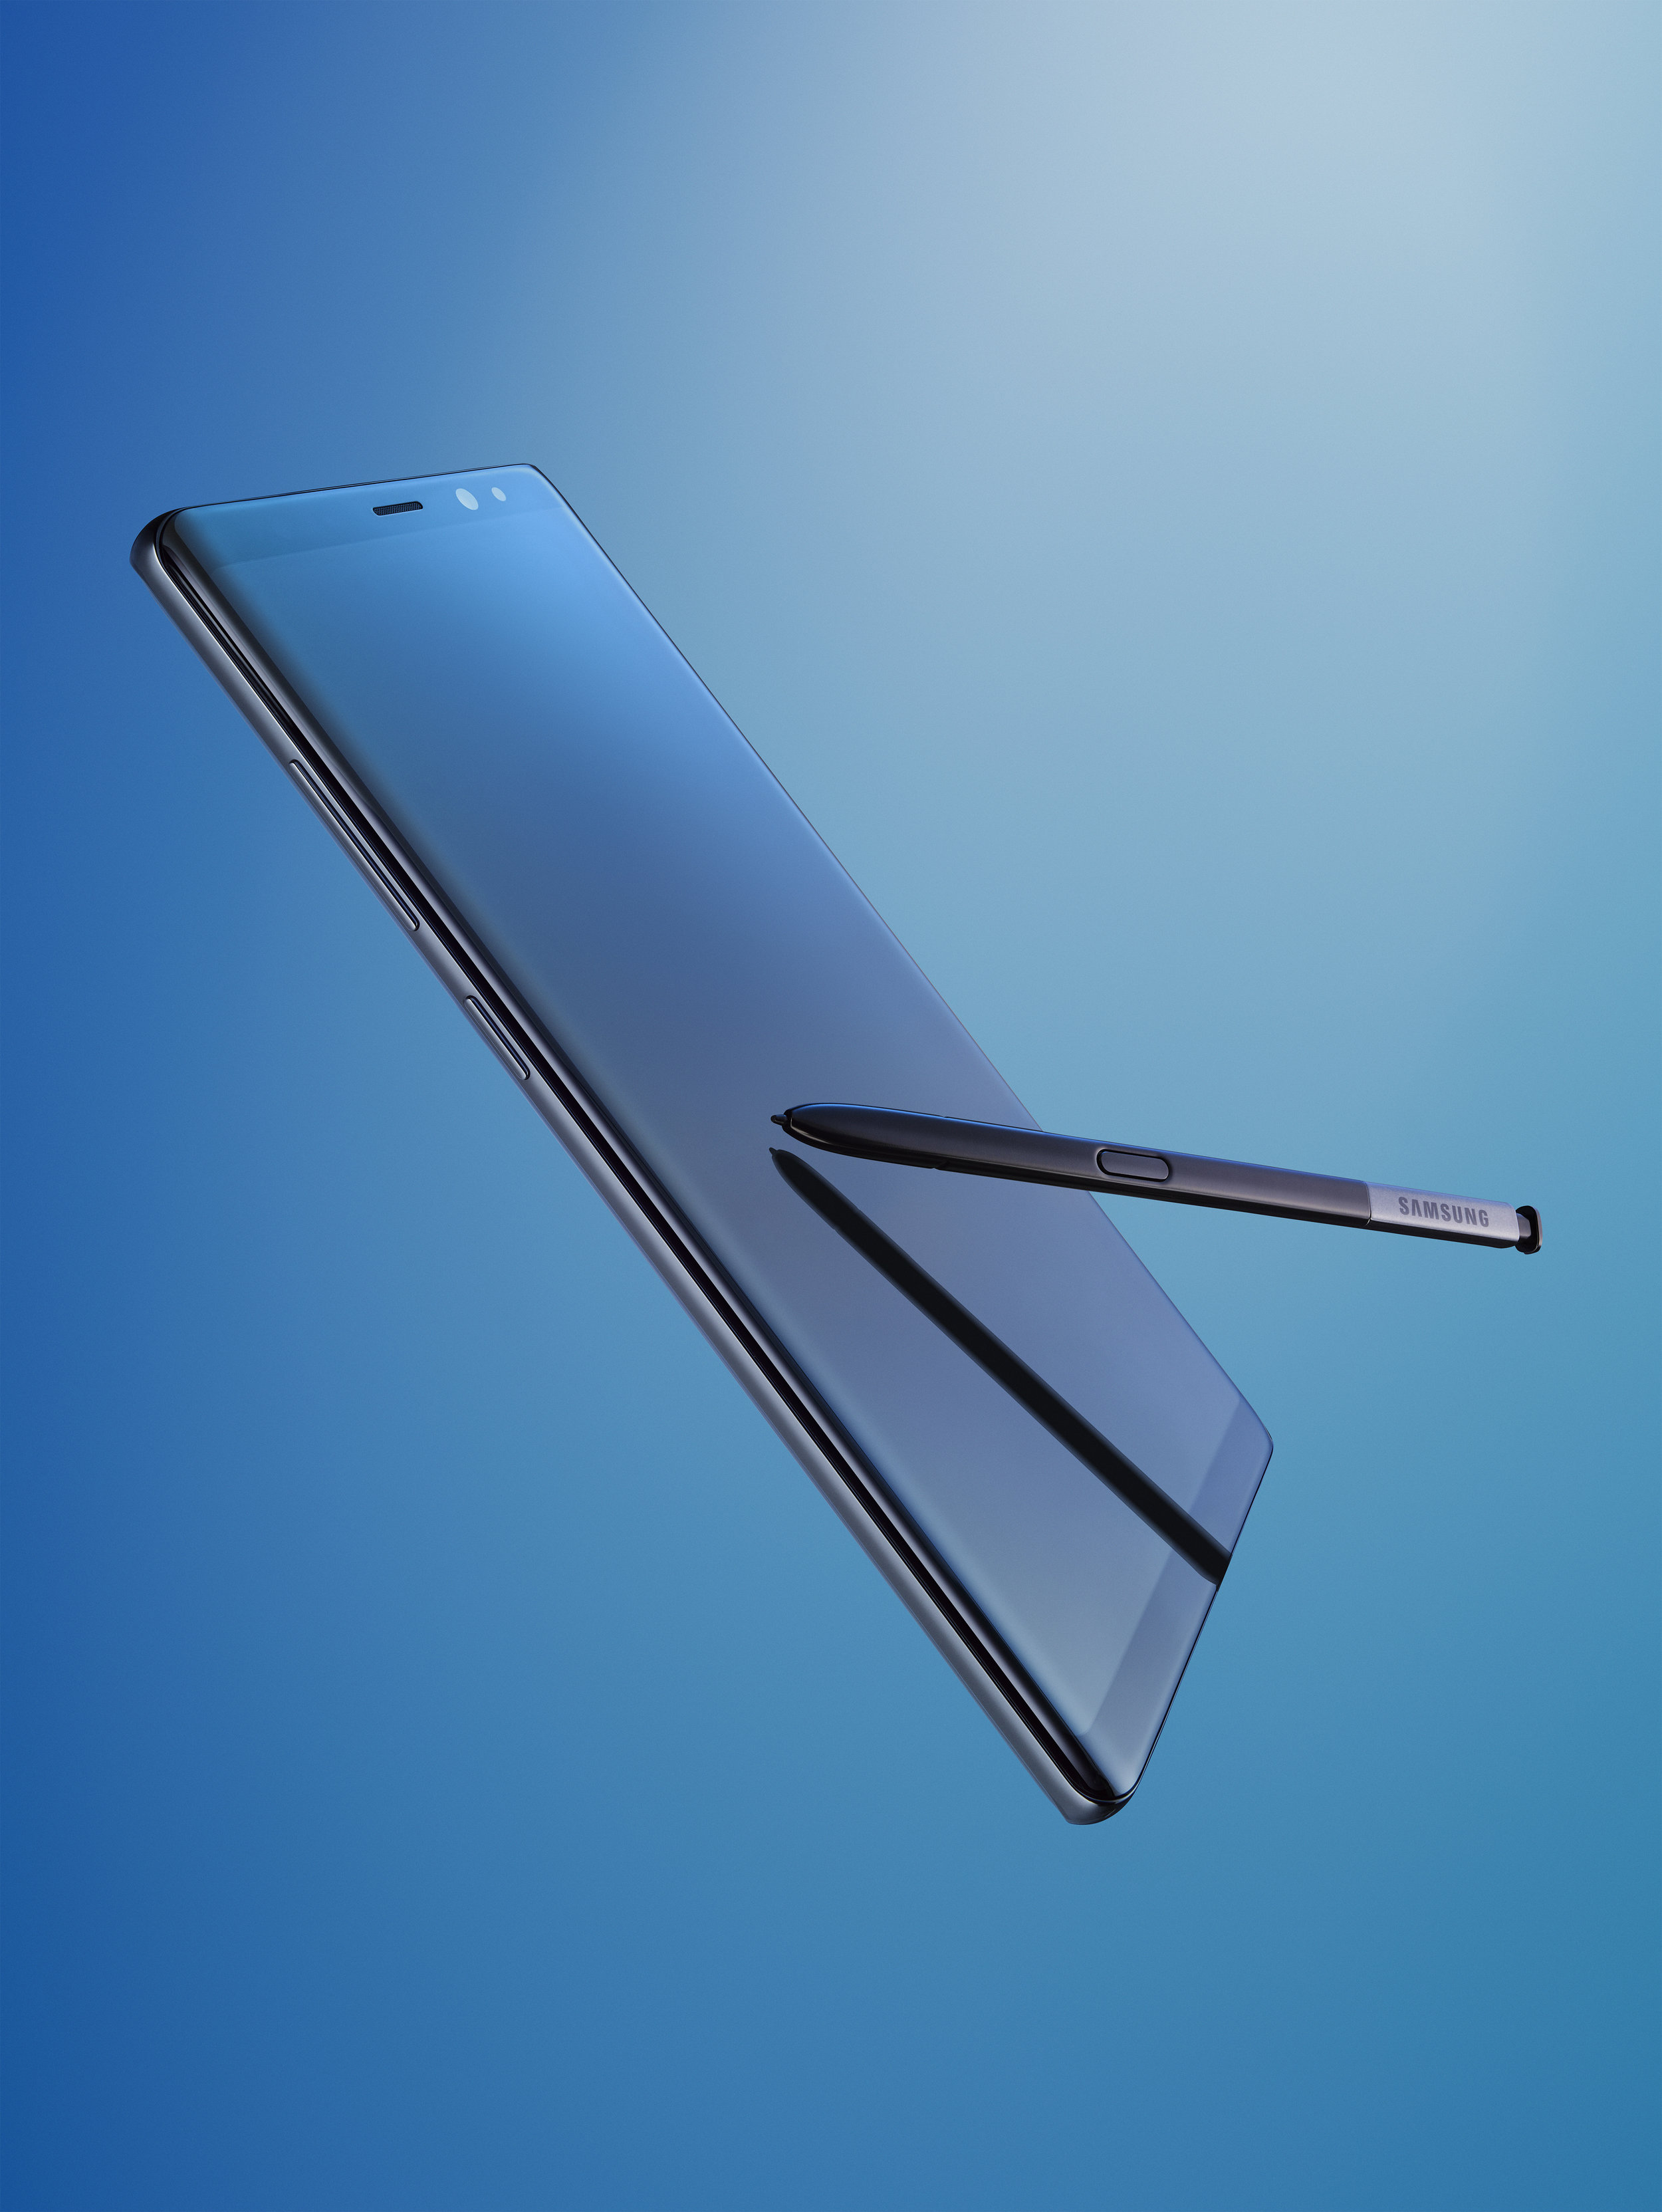 JC_Best_Buy_Samsung_Galaxy_041897_V1.jpg